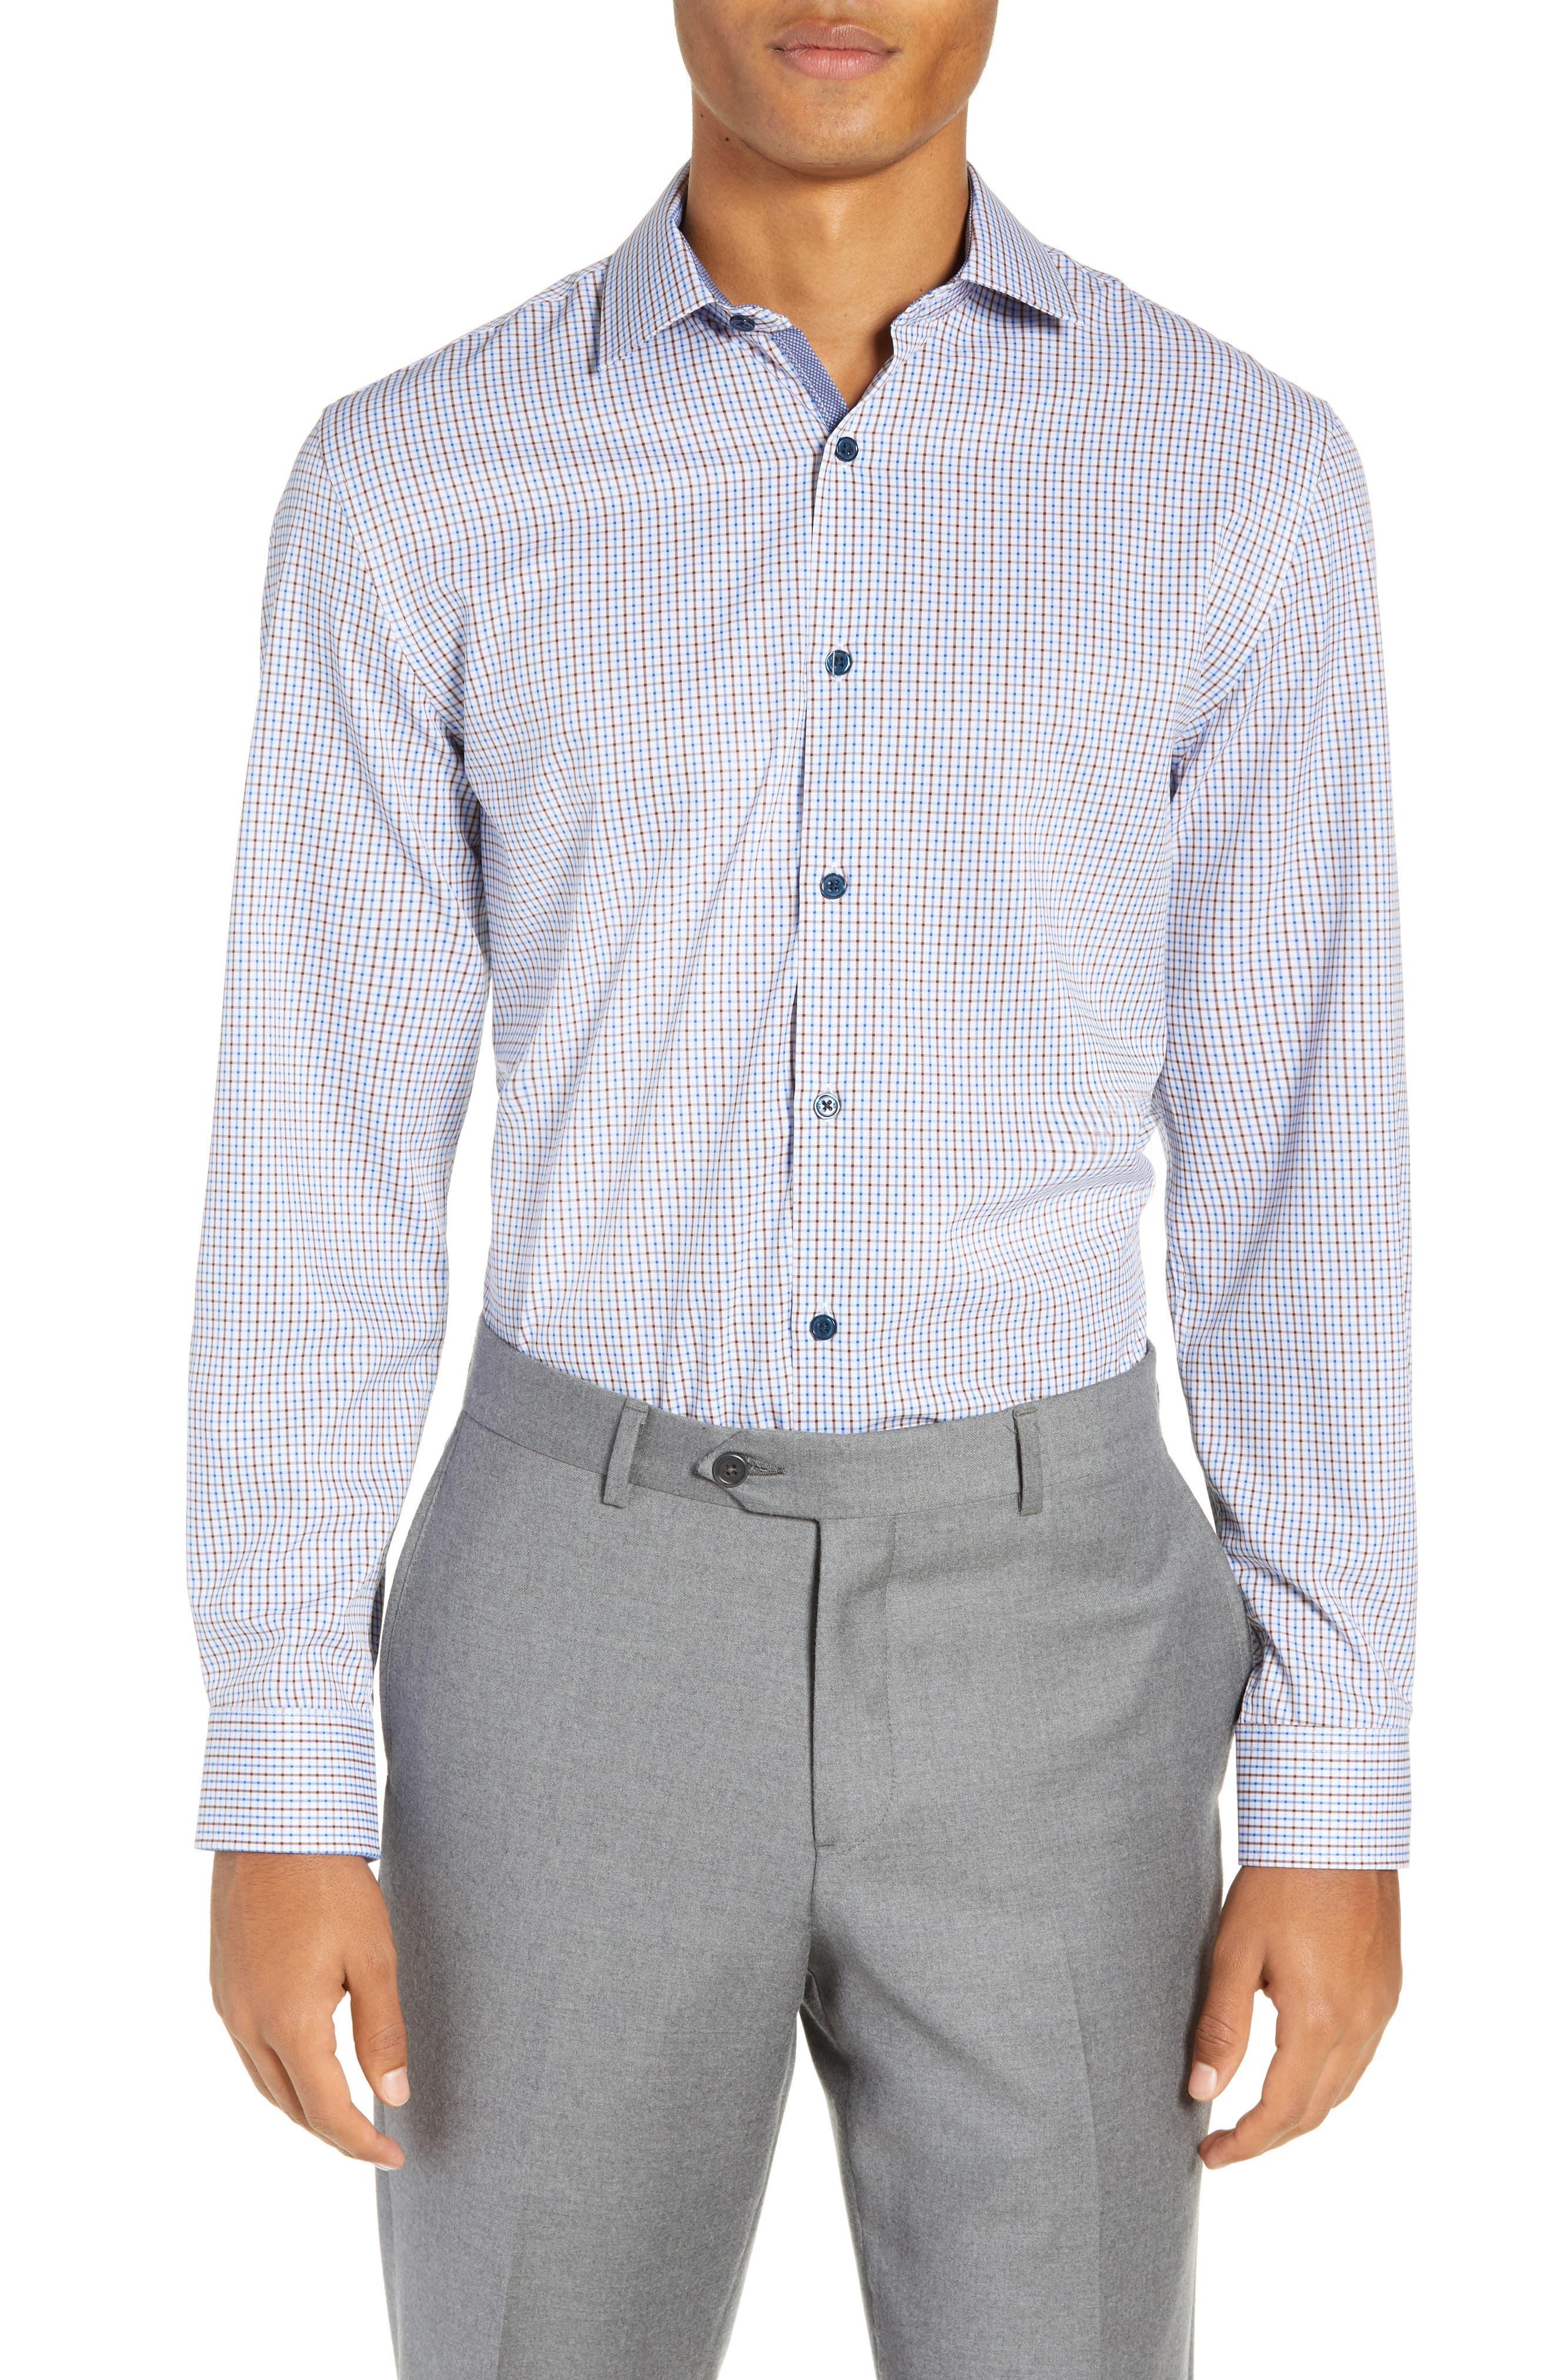 Trim Fit 4-Way Stretch Check Dress Shirt,                             Main thumbnail 1, color,                             BLUE